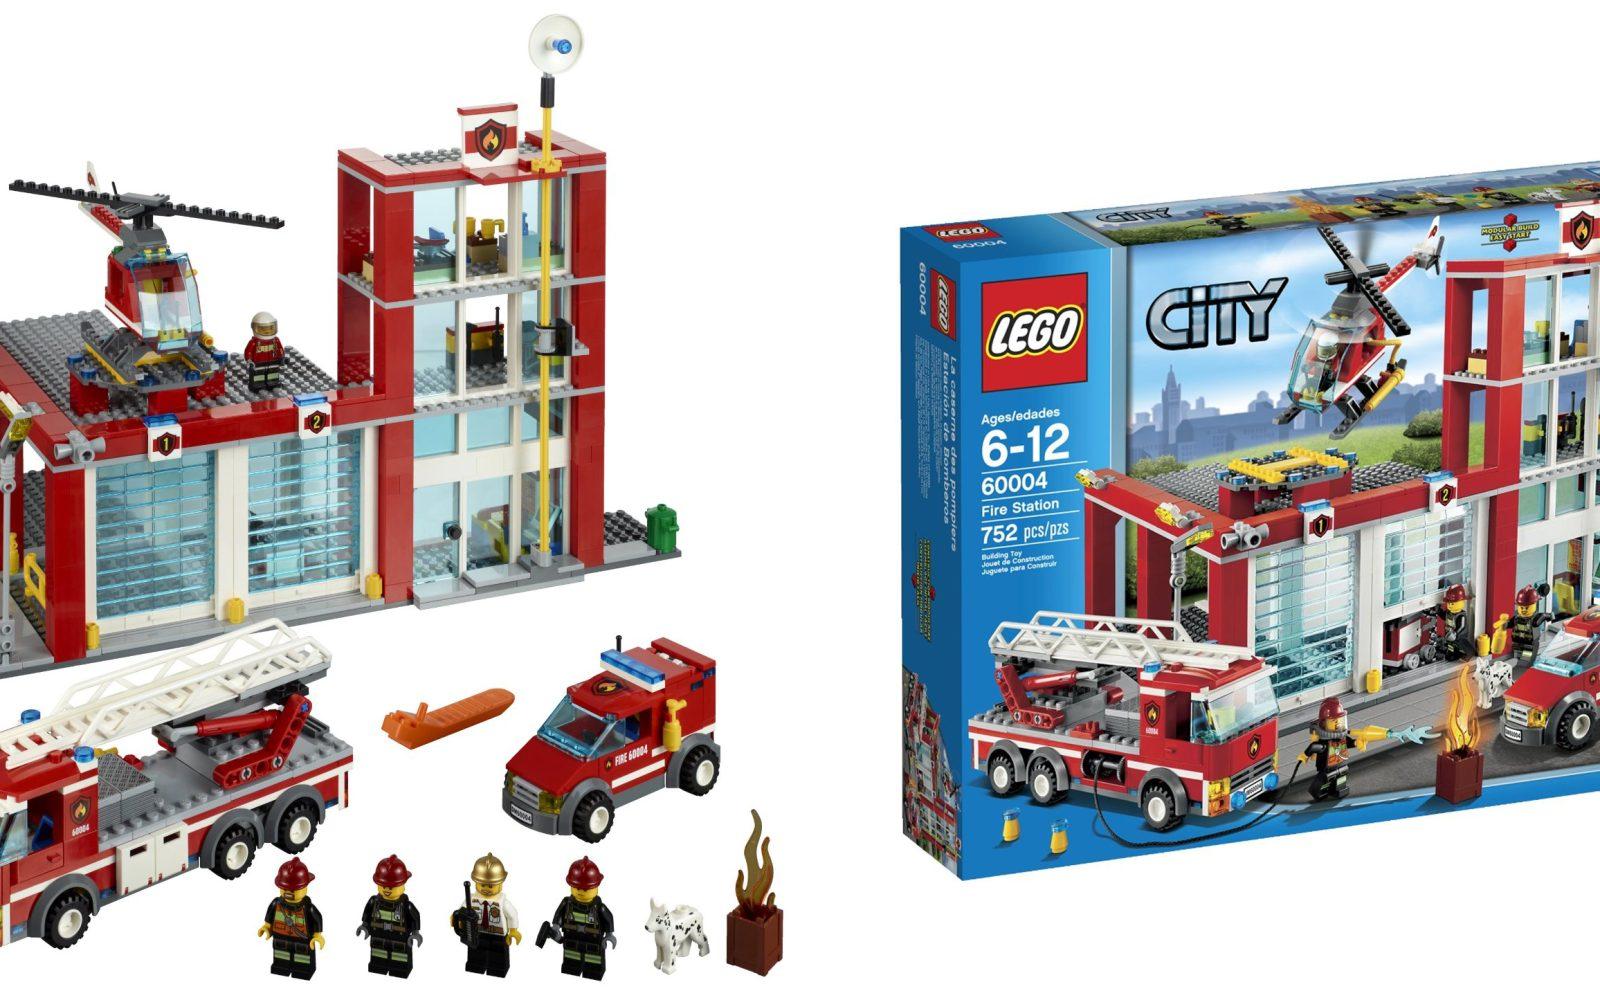 Barnes Noble 30 Off Toys Lego City Fire Station 70 Reg 100